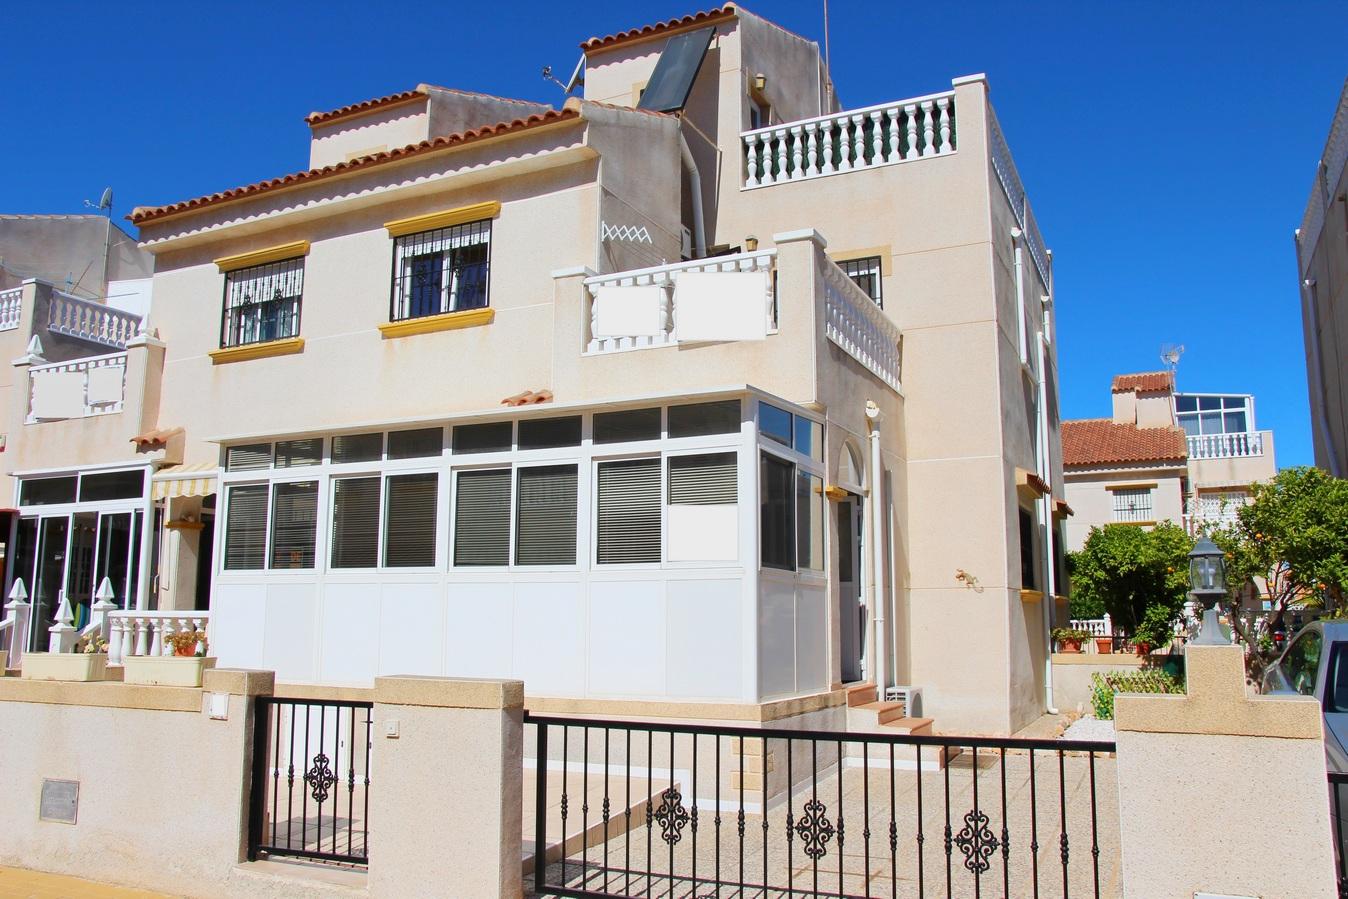 Quatro House in Coral 2, Torrevieja